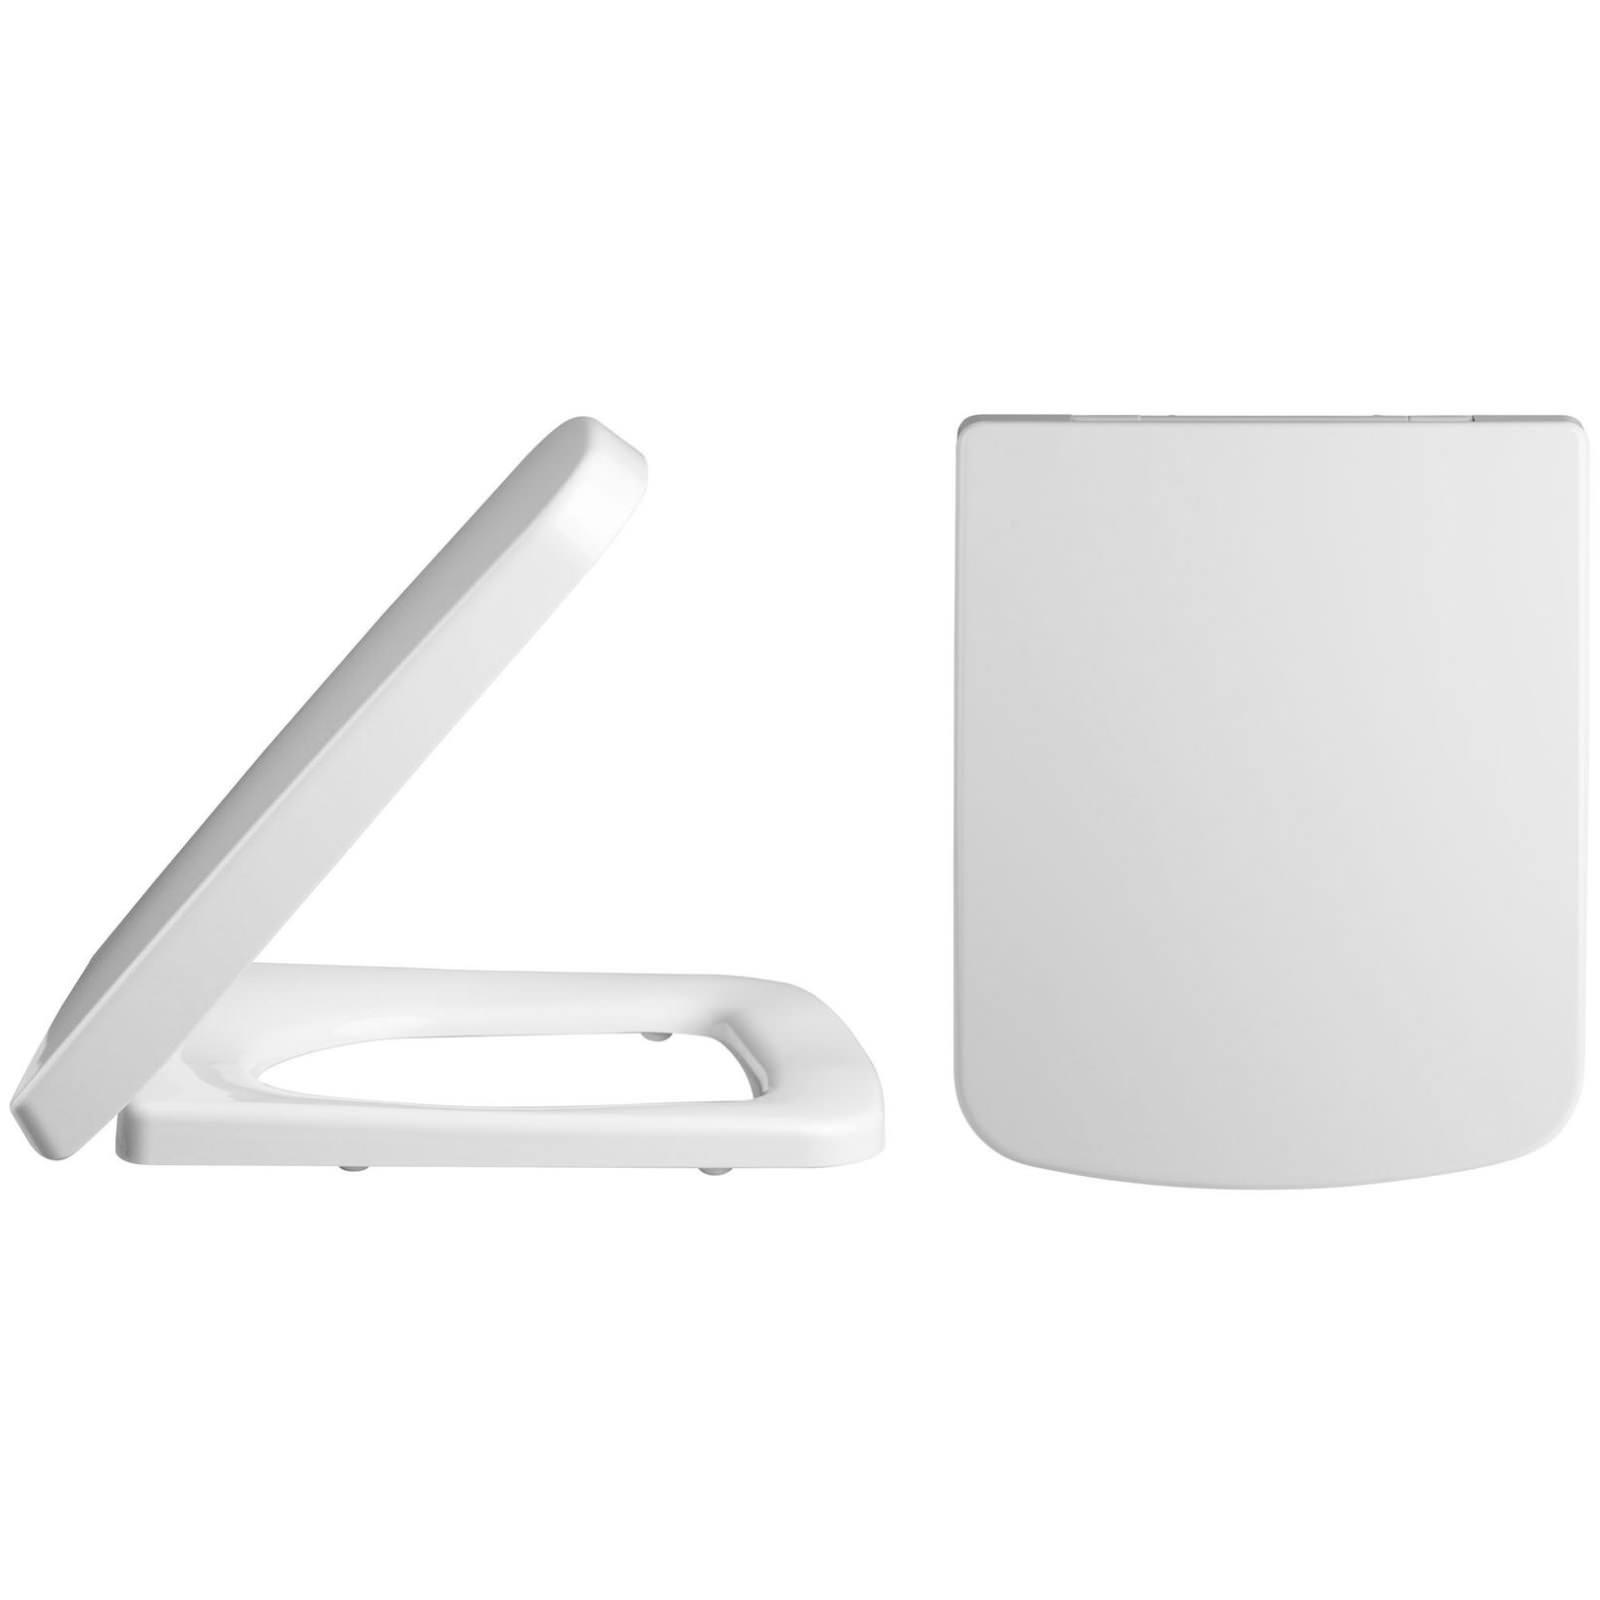 lauren standard square top fix soft close toilet seat and. Black Bedroom Furniture Sets. Home Design Ideas